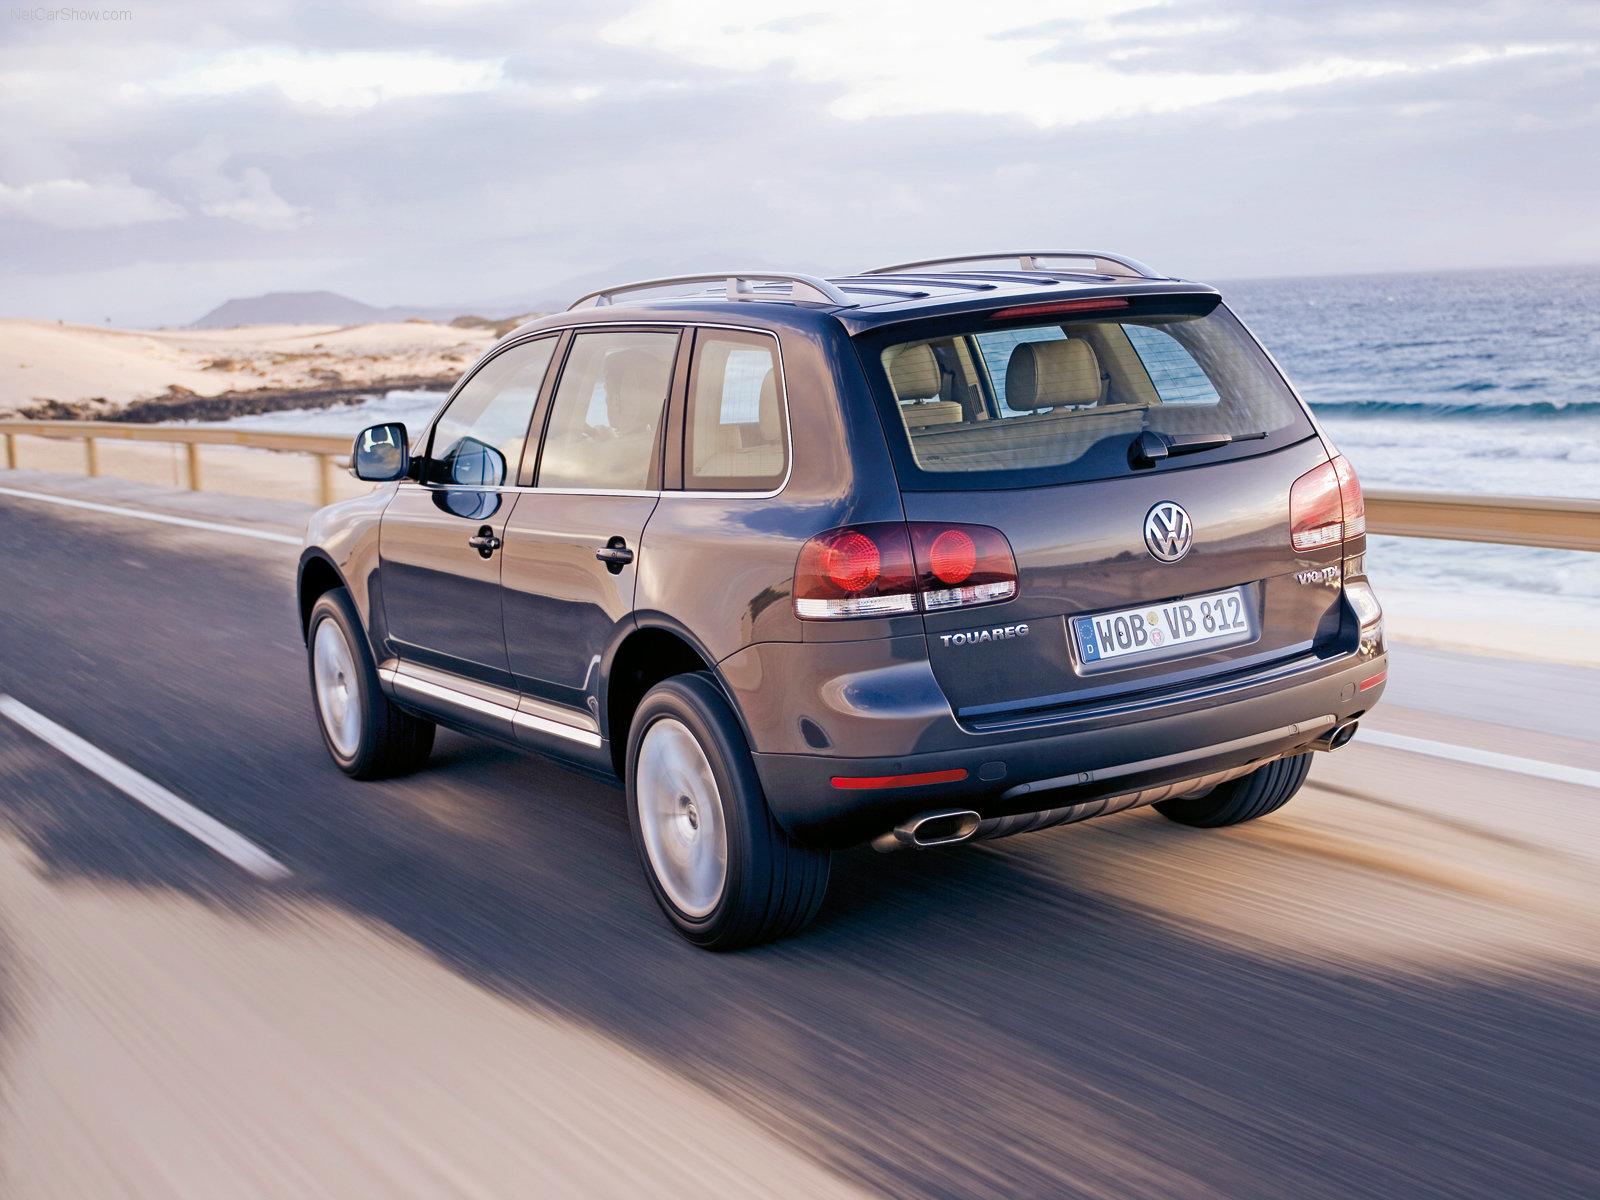 https://w04.ru/foto/Volkswagen-Touareg_2007_1600x1200_wallpaper_19.jpg